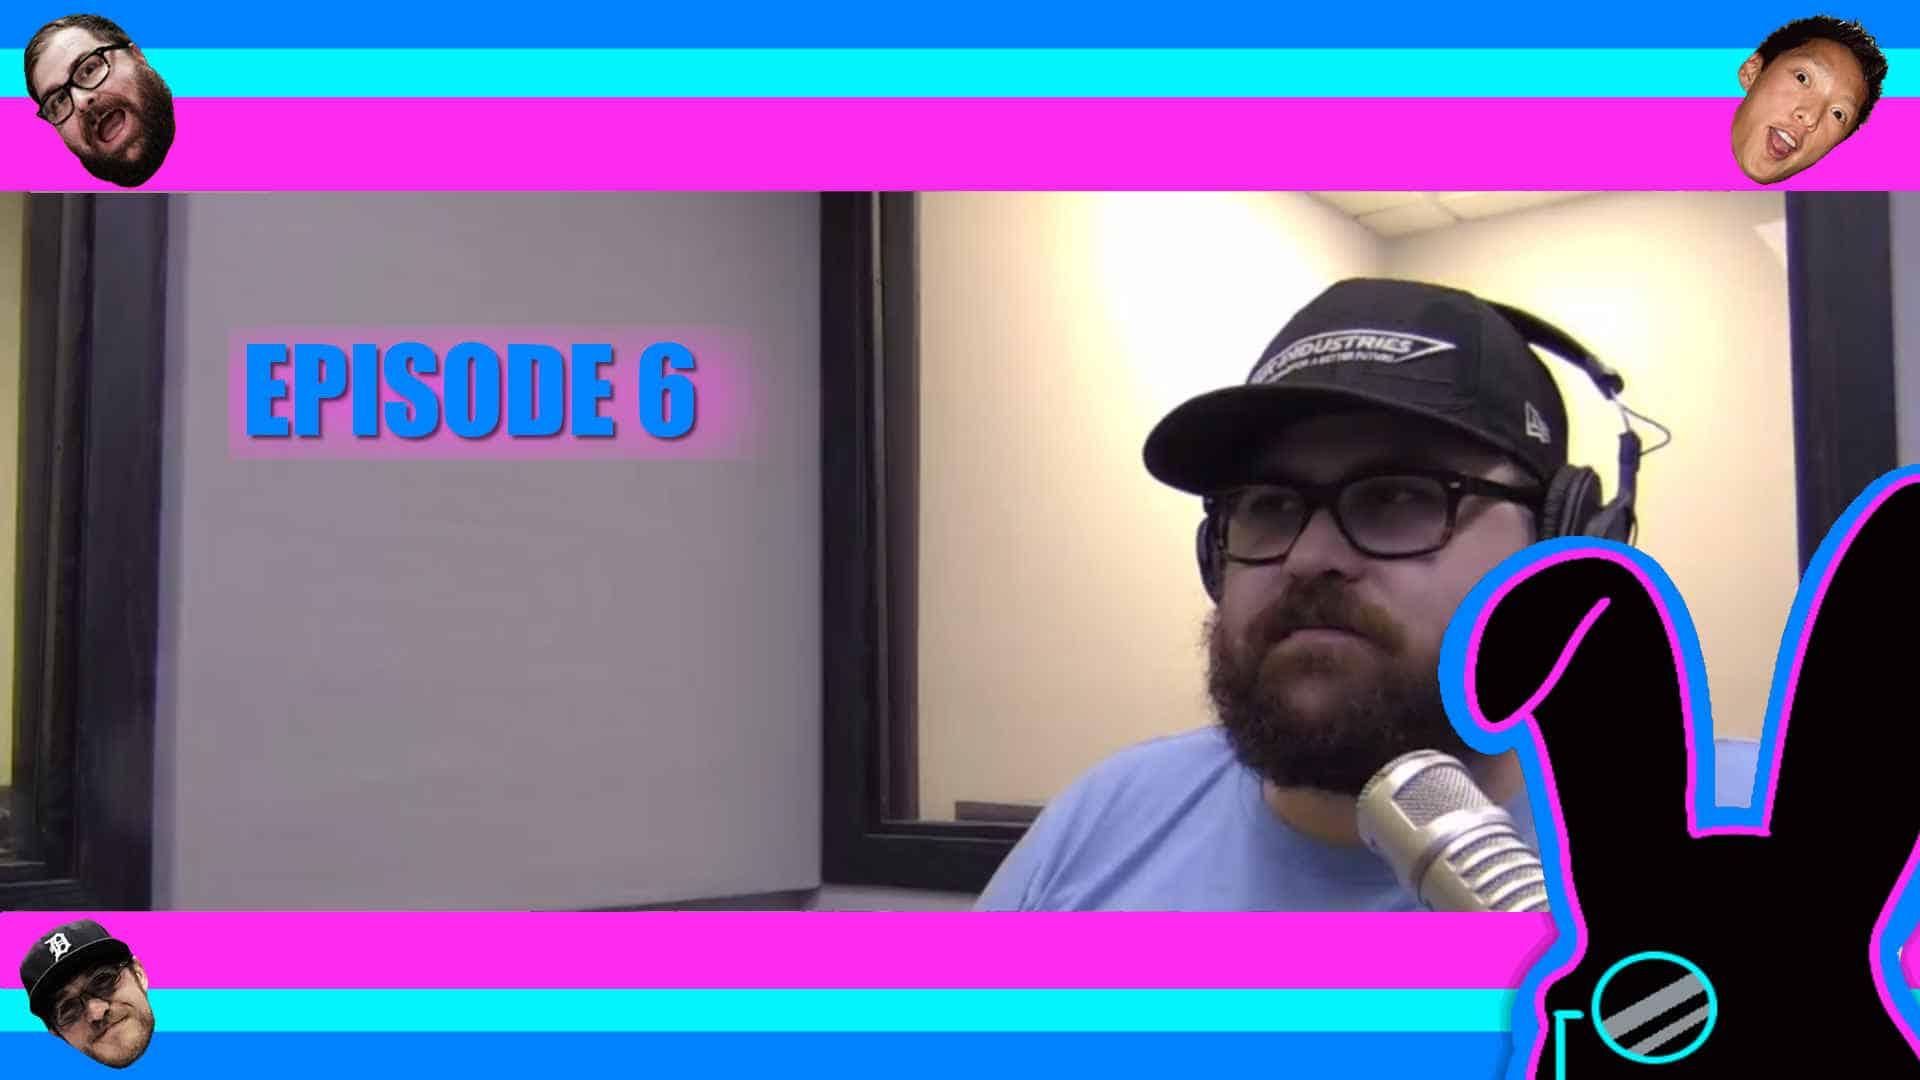 Geektainment Weekly - Episode 6